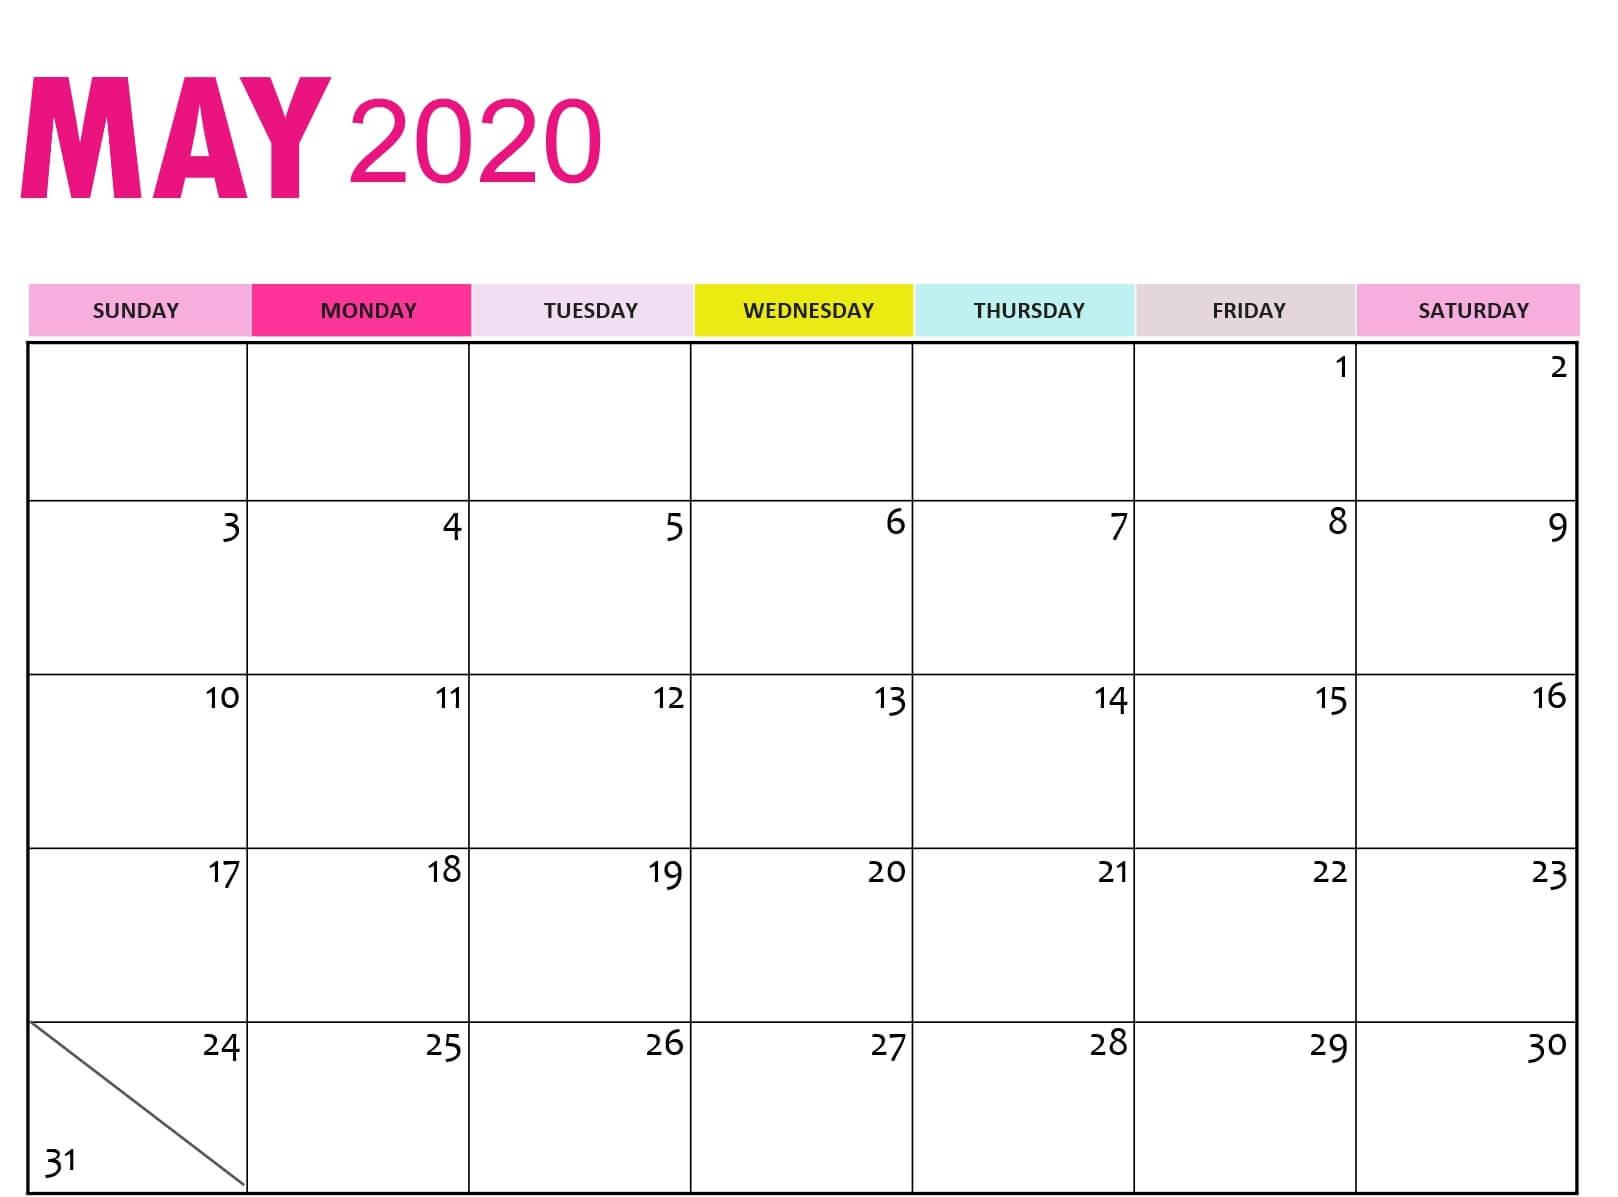 Blank Calendar For May 2020